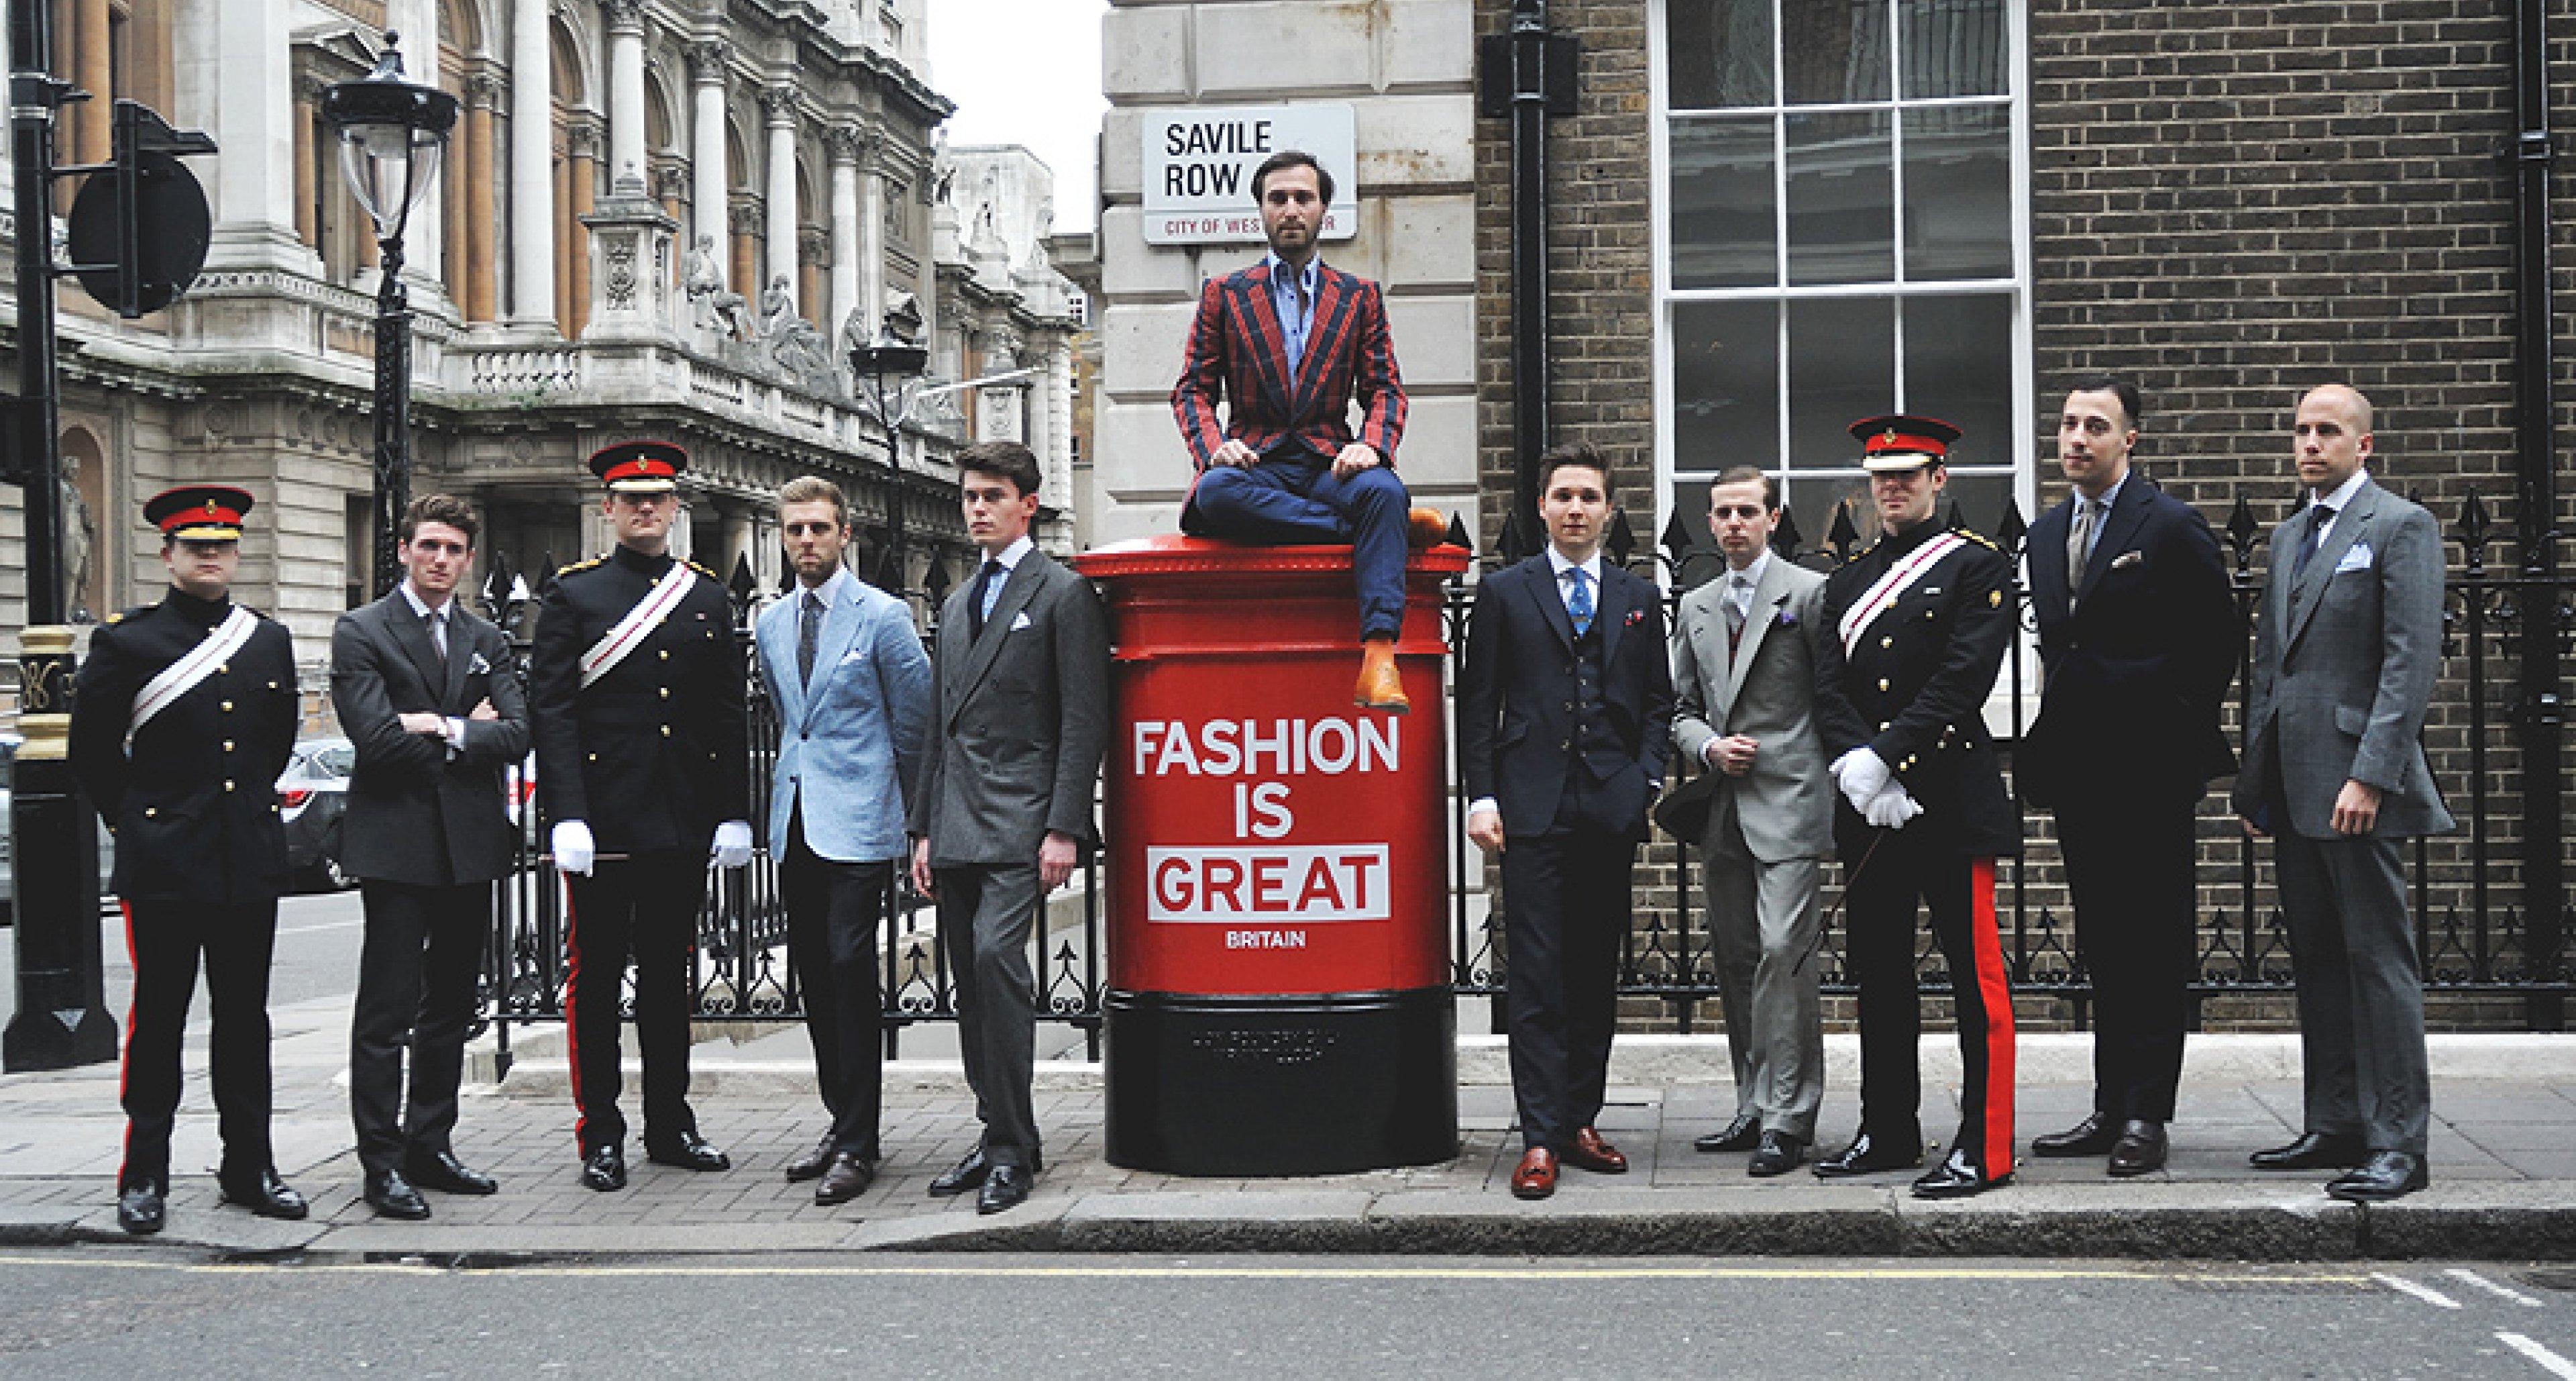 'Fashion is GREAT': Savile Row and Burlington Arcade ...